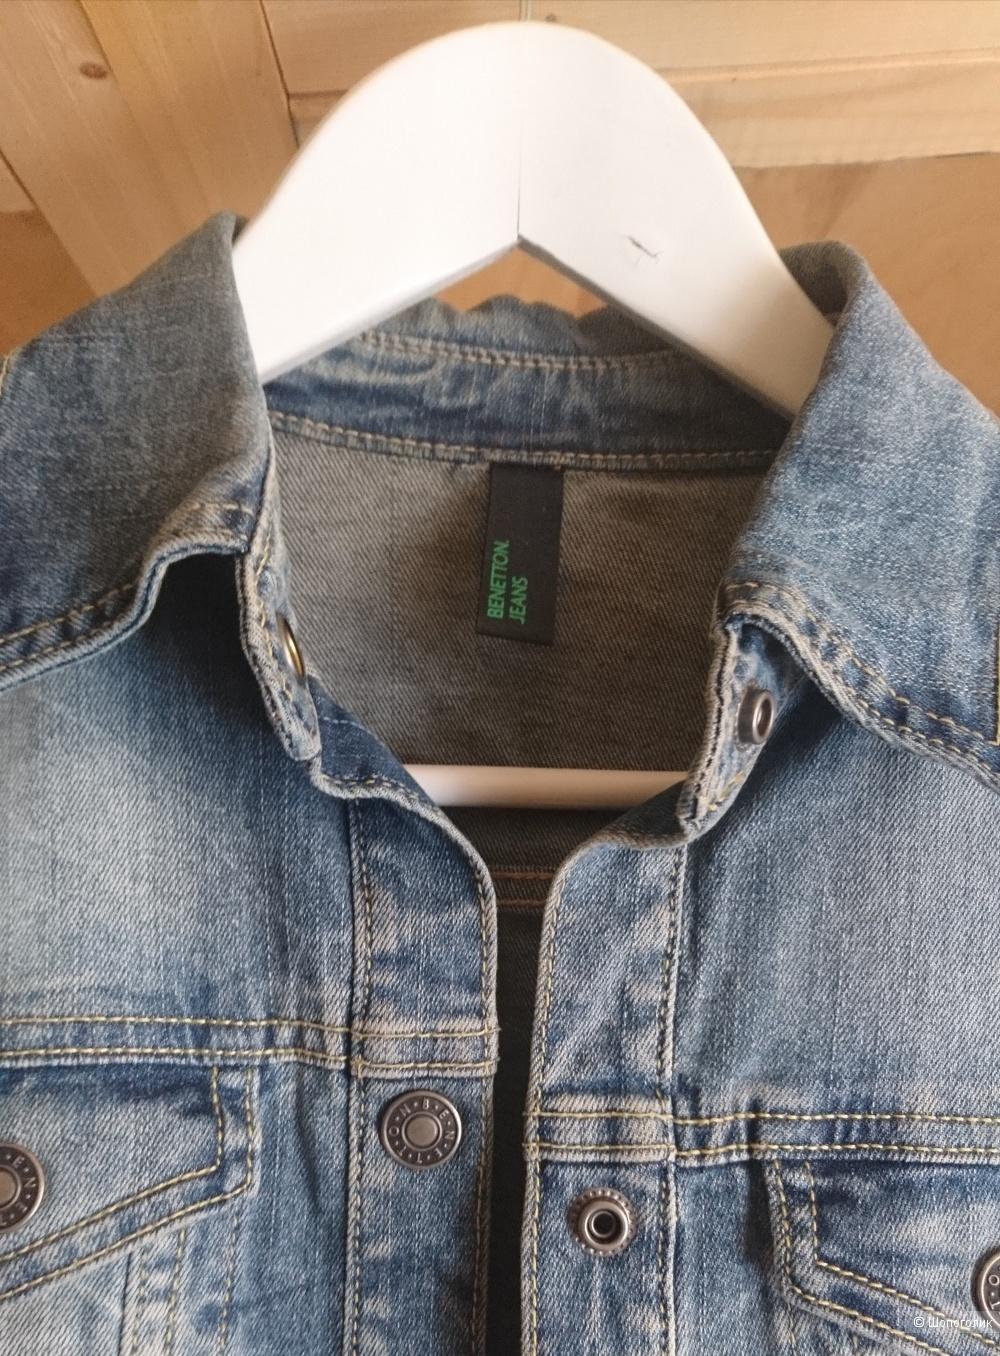 Джинсовая  куртка Beneton, размер xs.